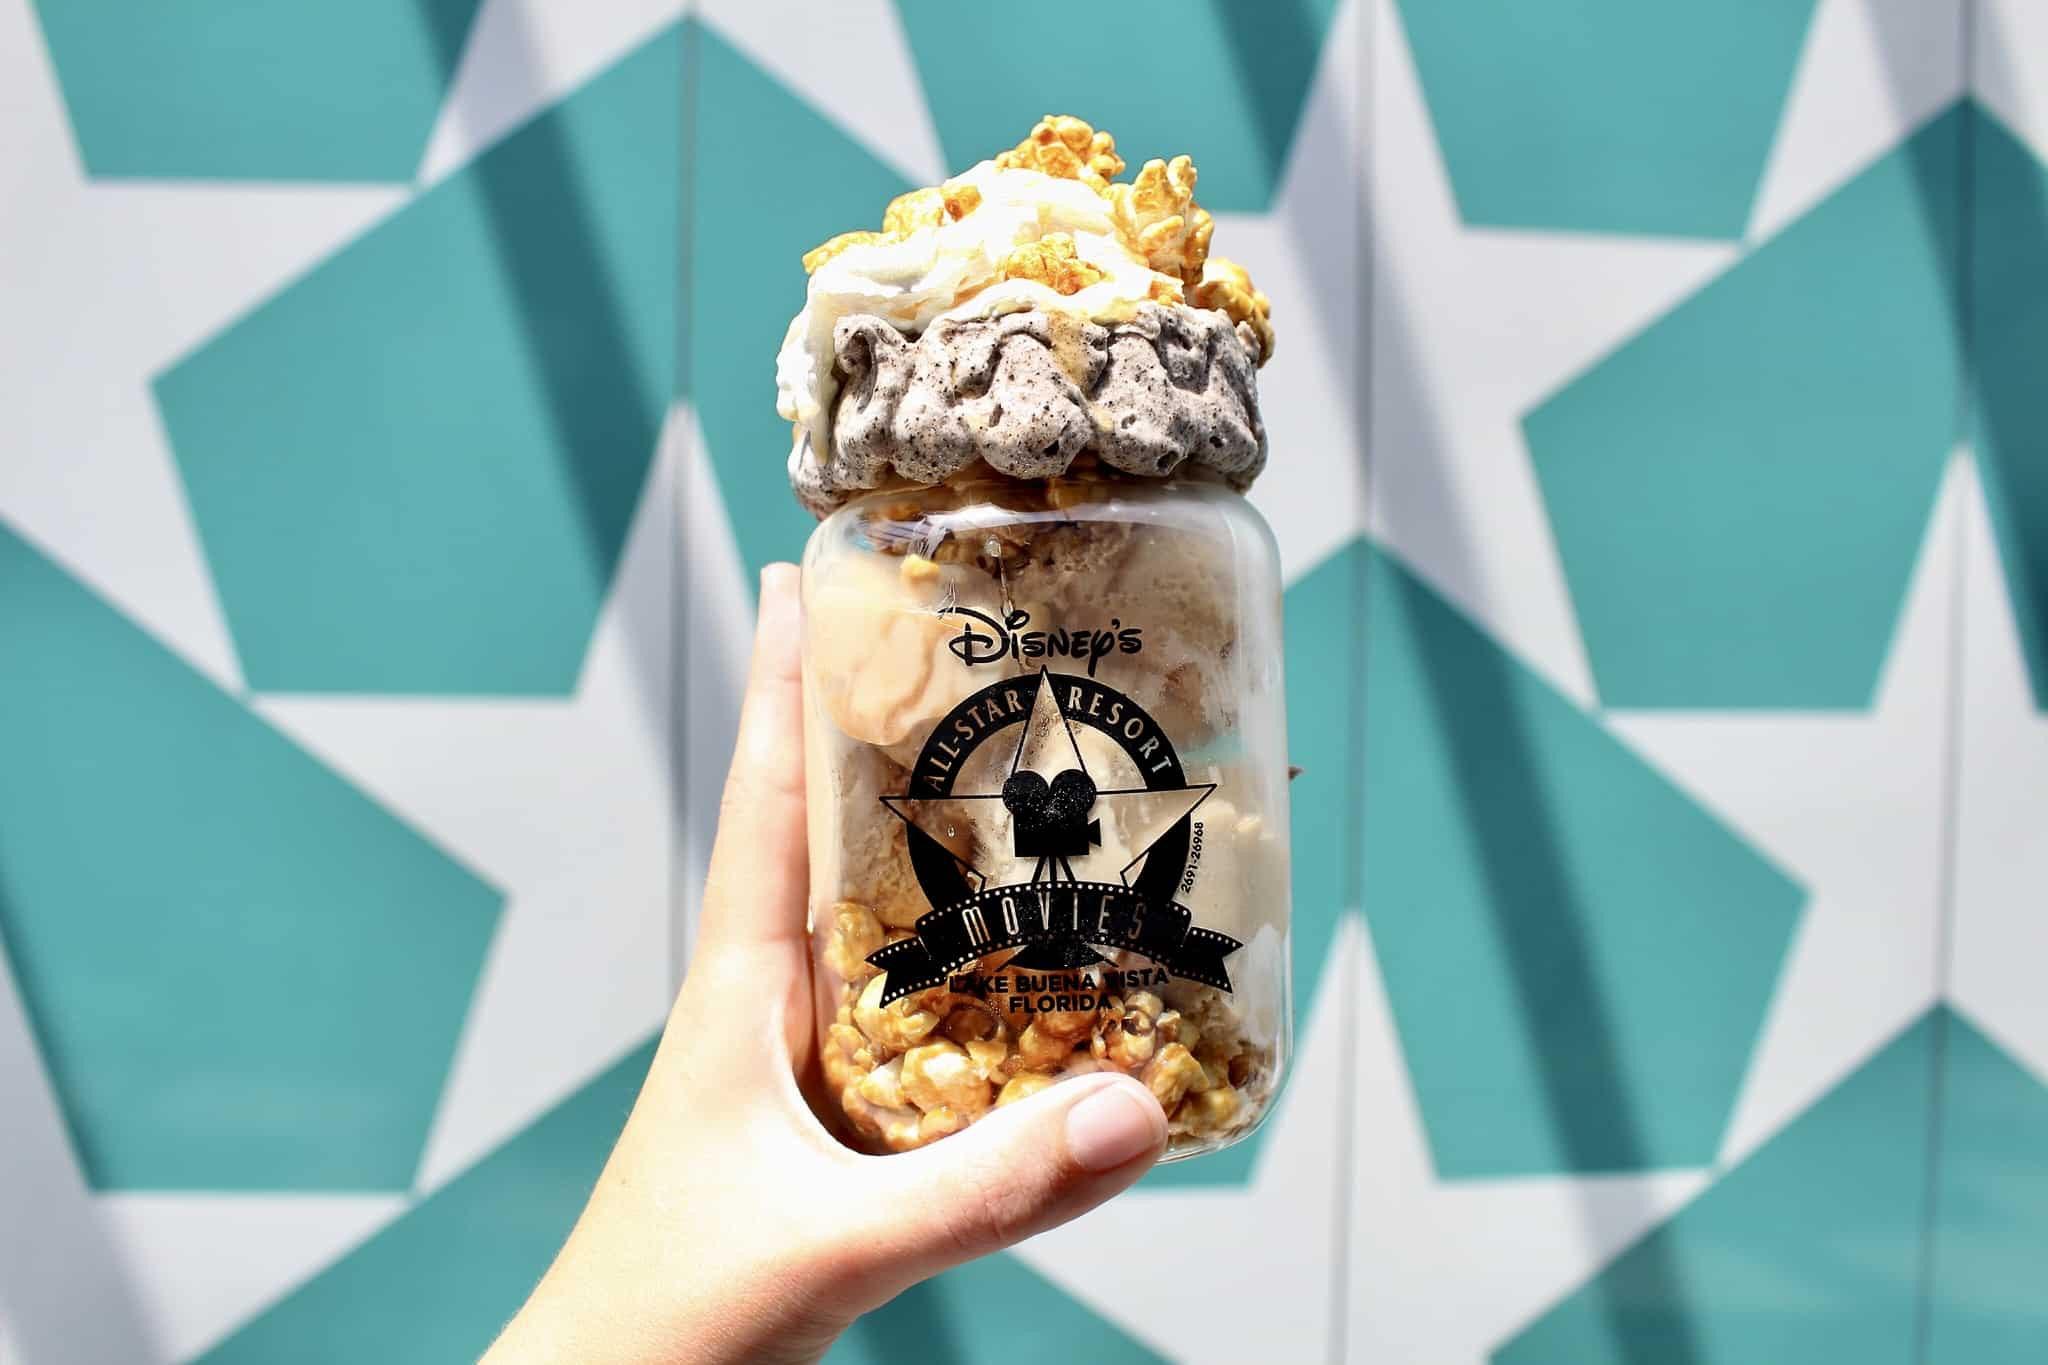 cinema popcorn sundae